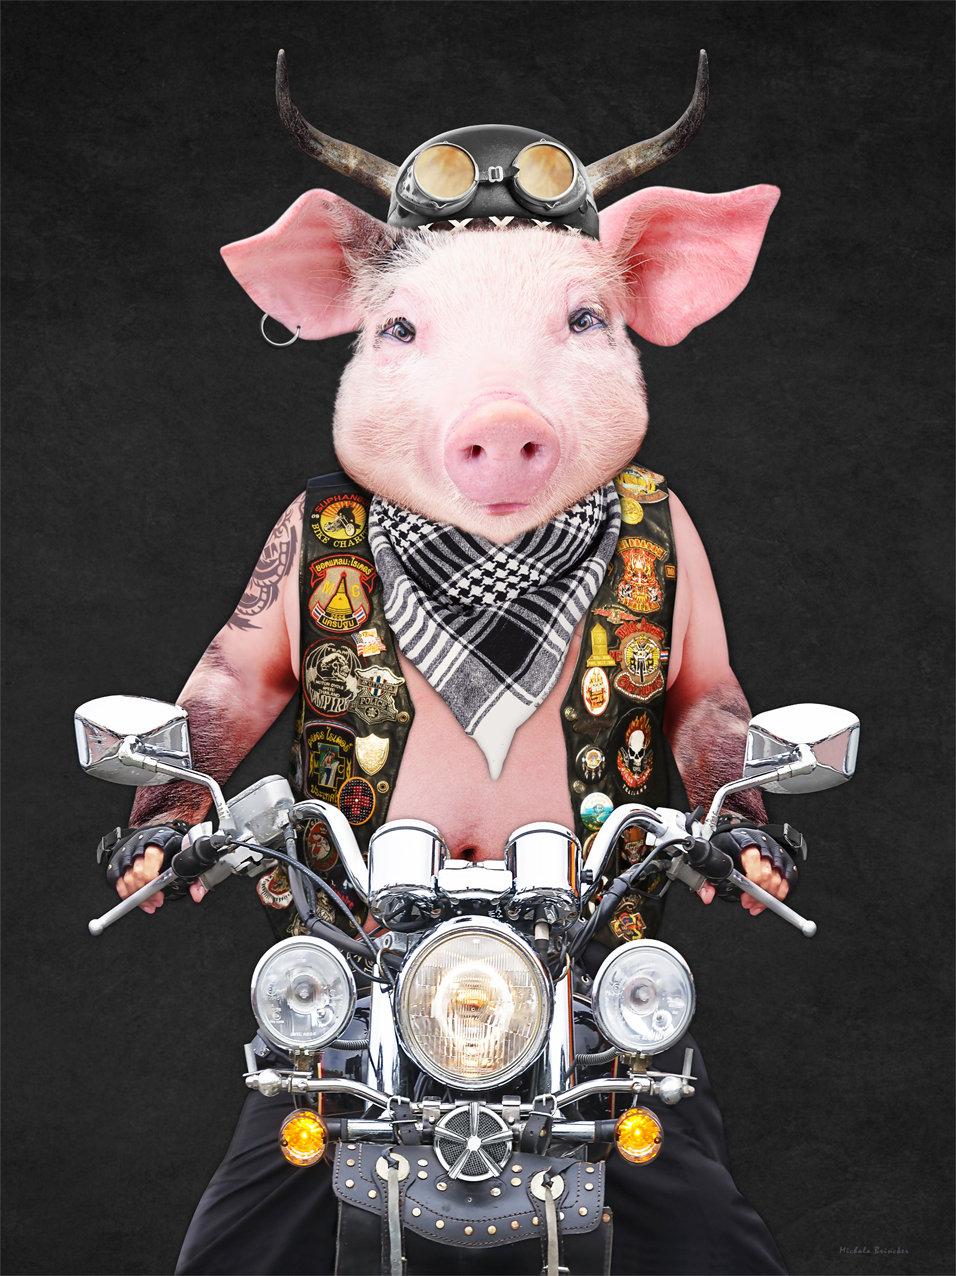 pig_on_Harley_artwork_Michala_Brincker_1